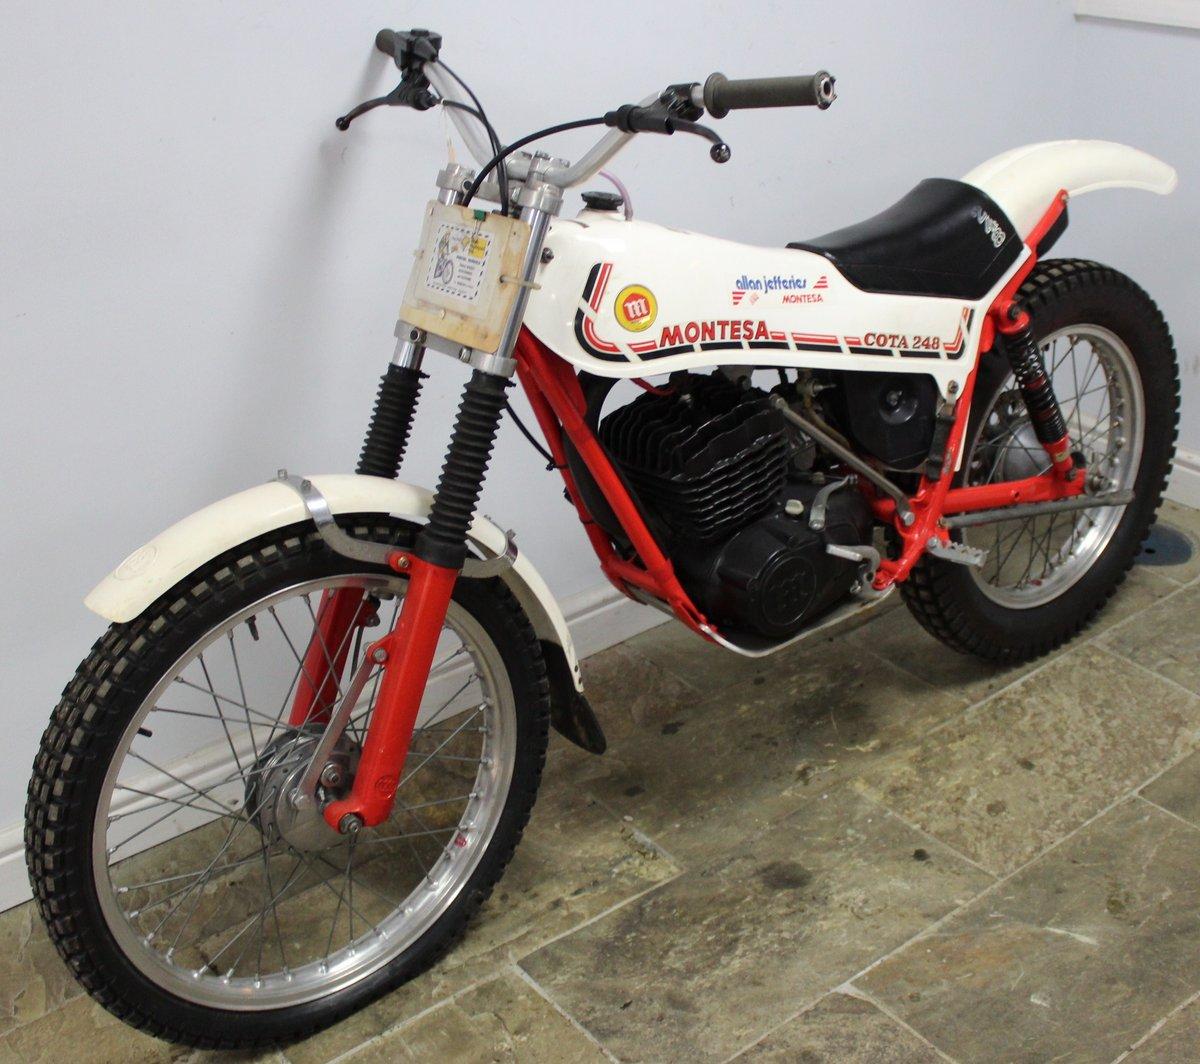 1981 Montesa Cota 248 Twin Shock Trials Bike Excellent  SOLD (picture 6 of 6)